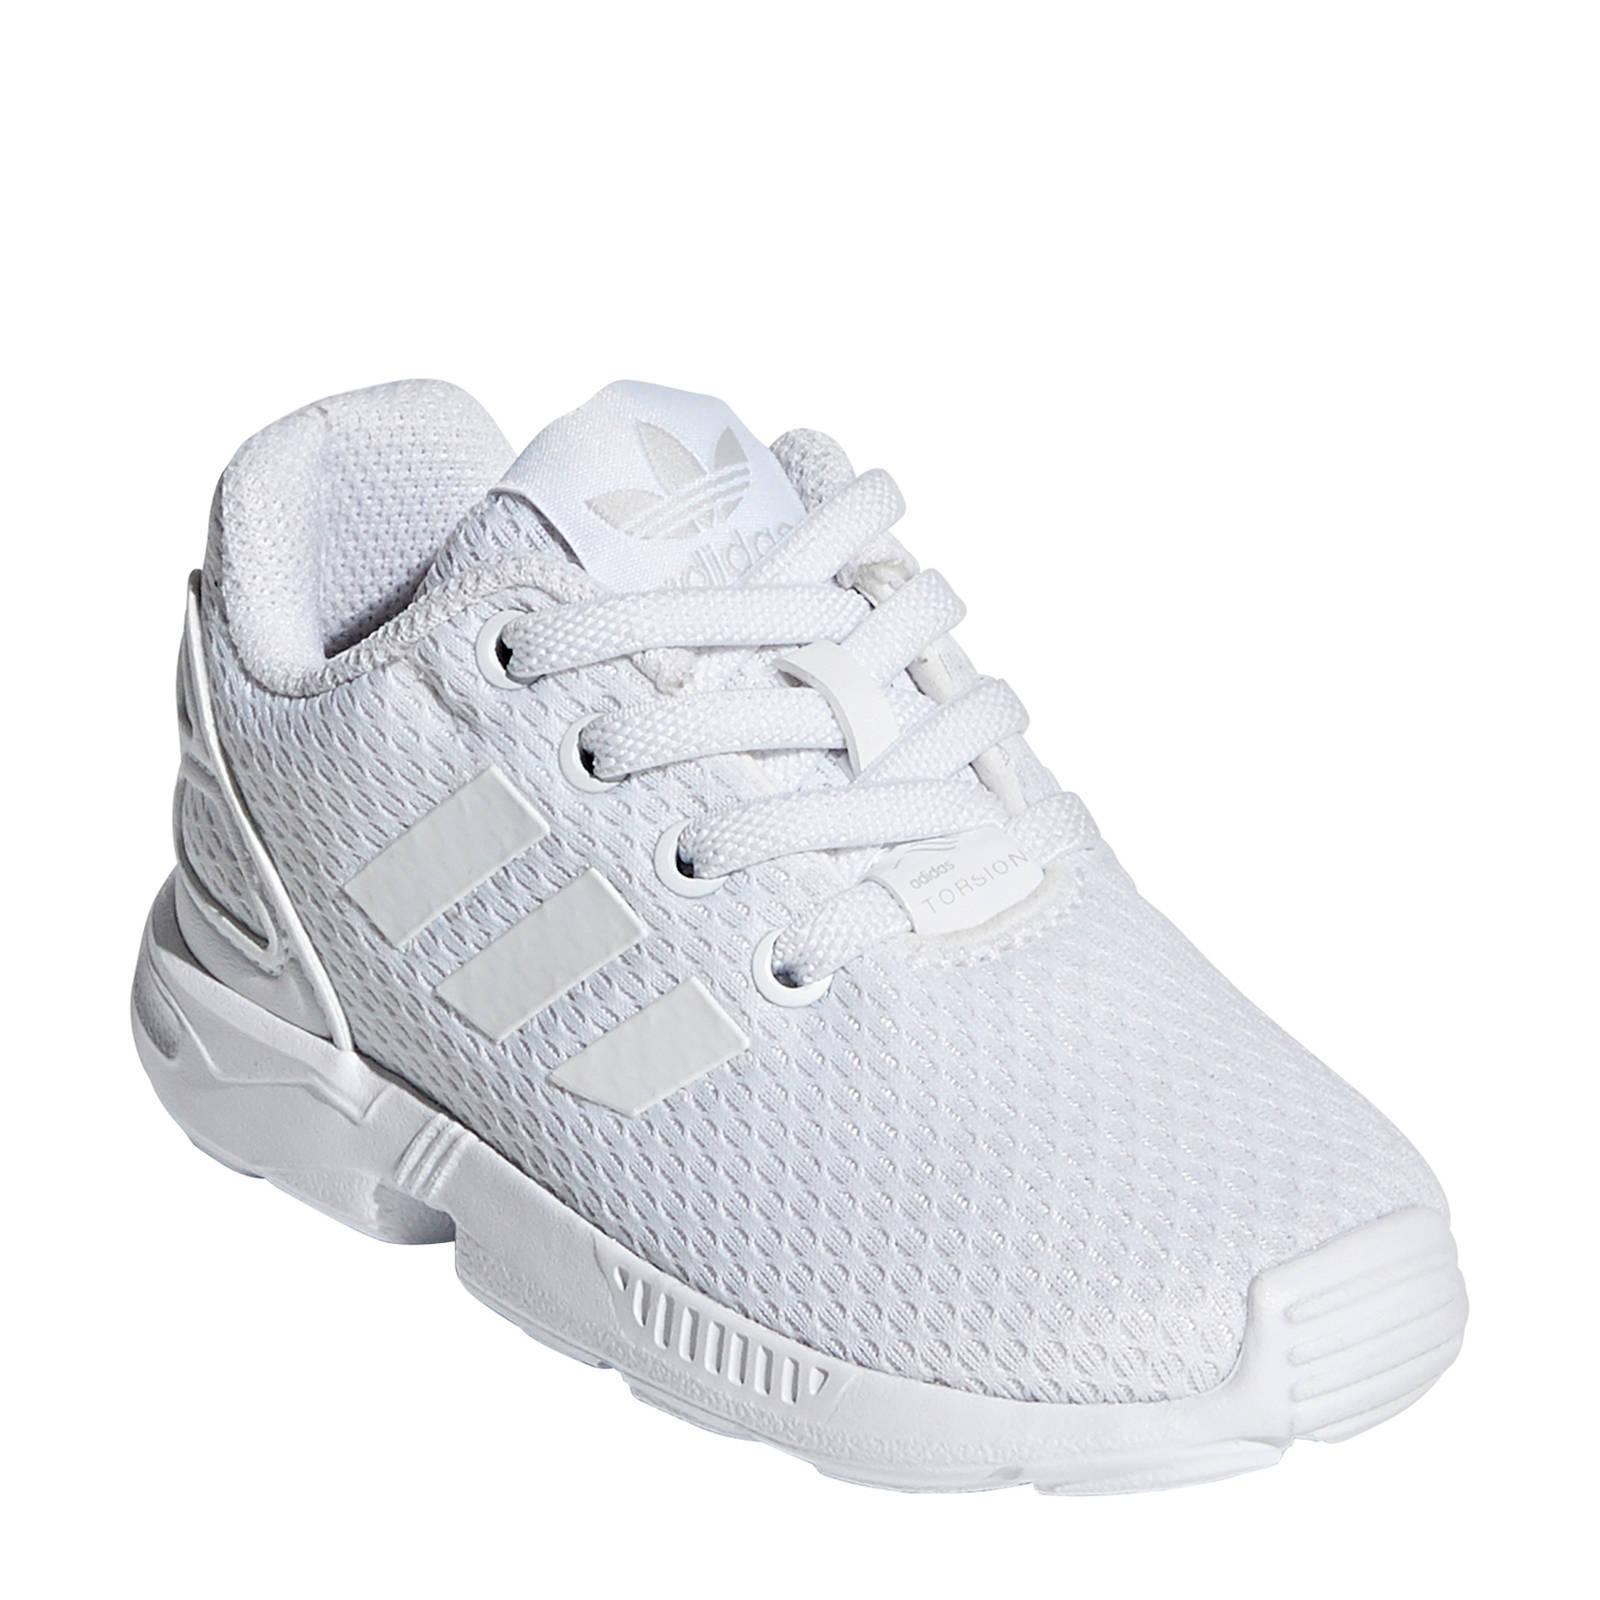 adidas zx flux wit